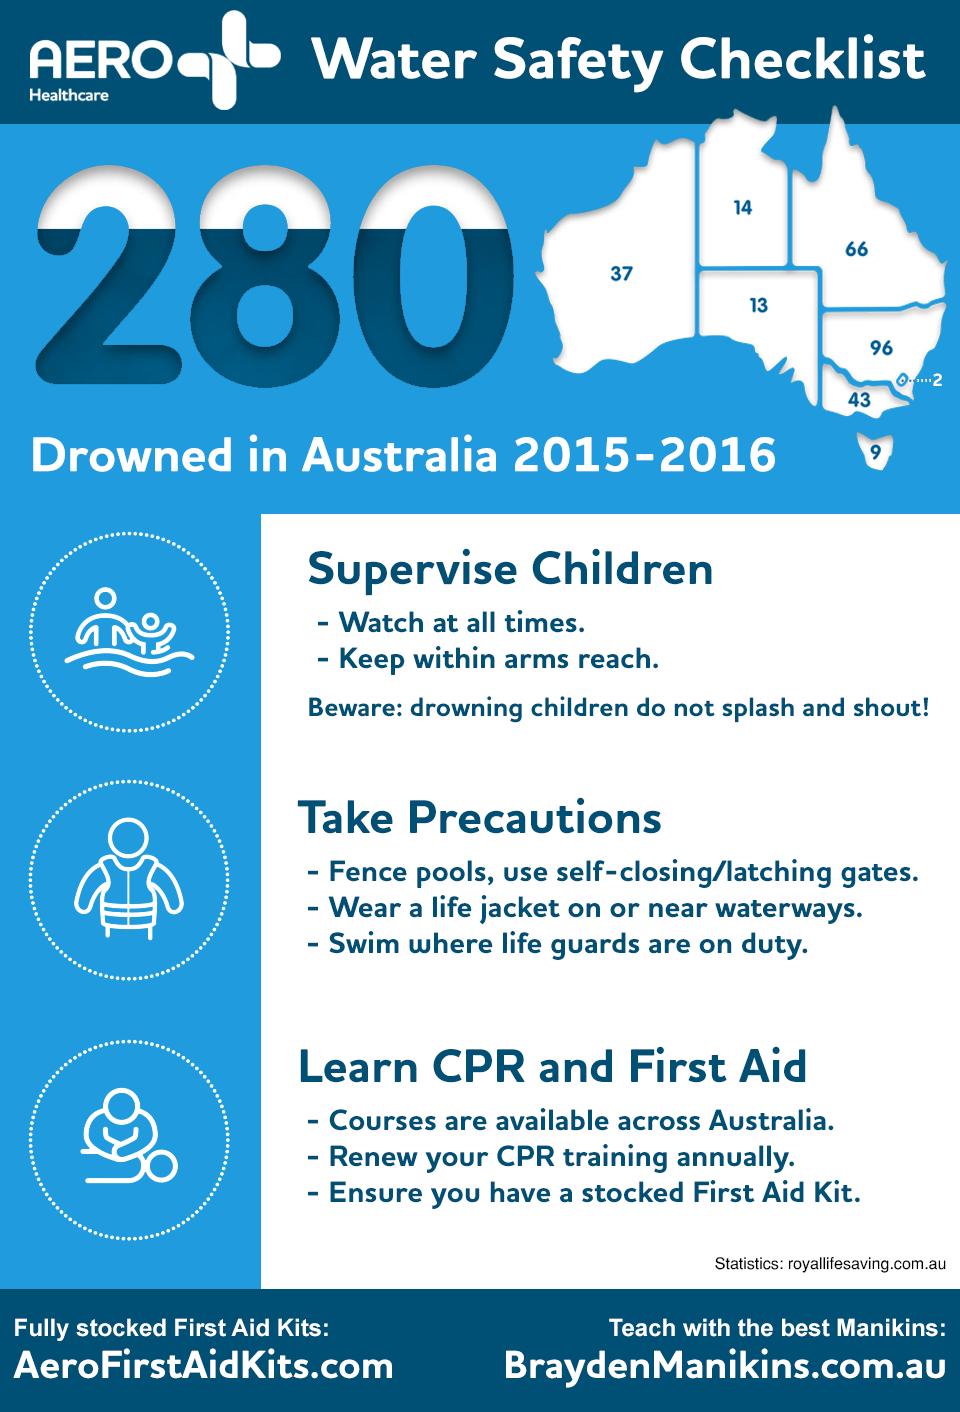 Water Safety Checklist Aero Healthcare Au